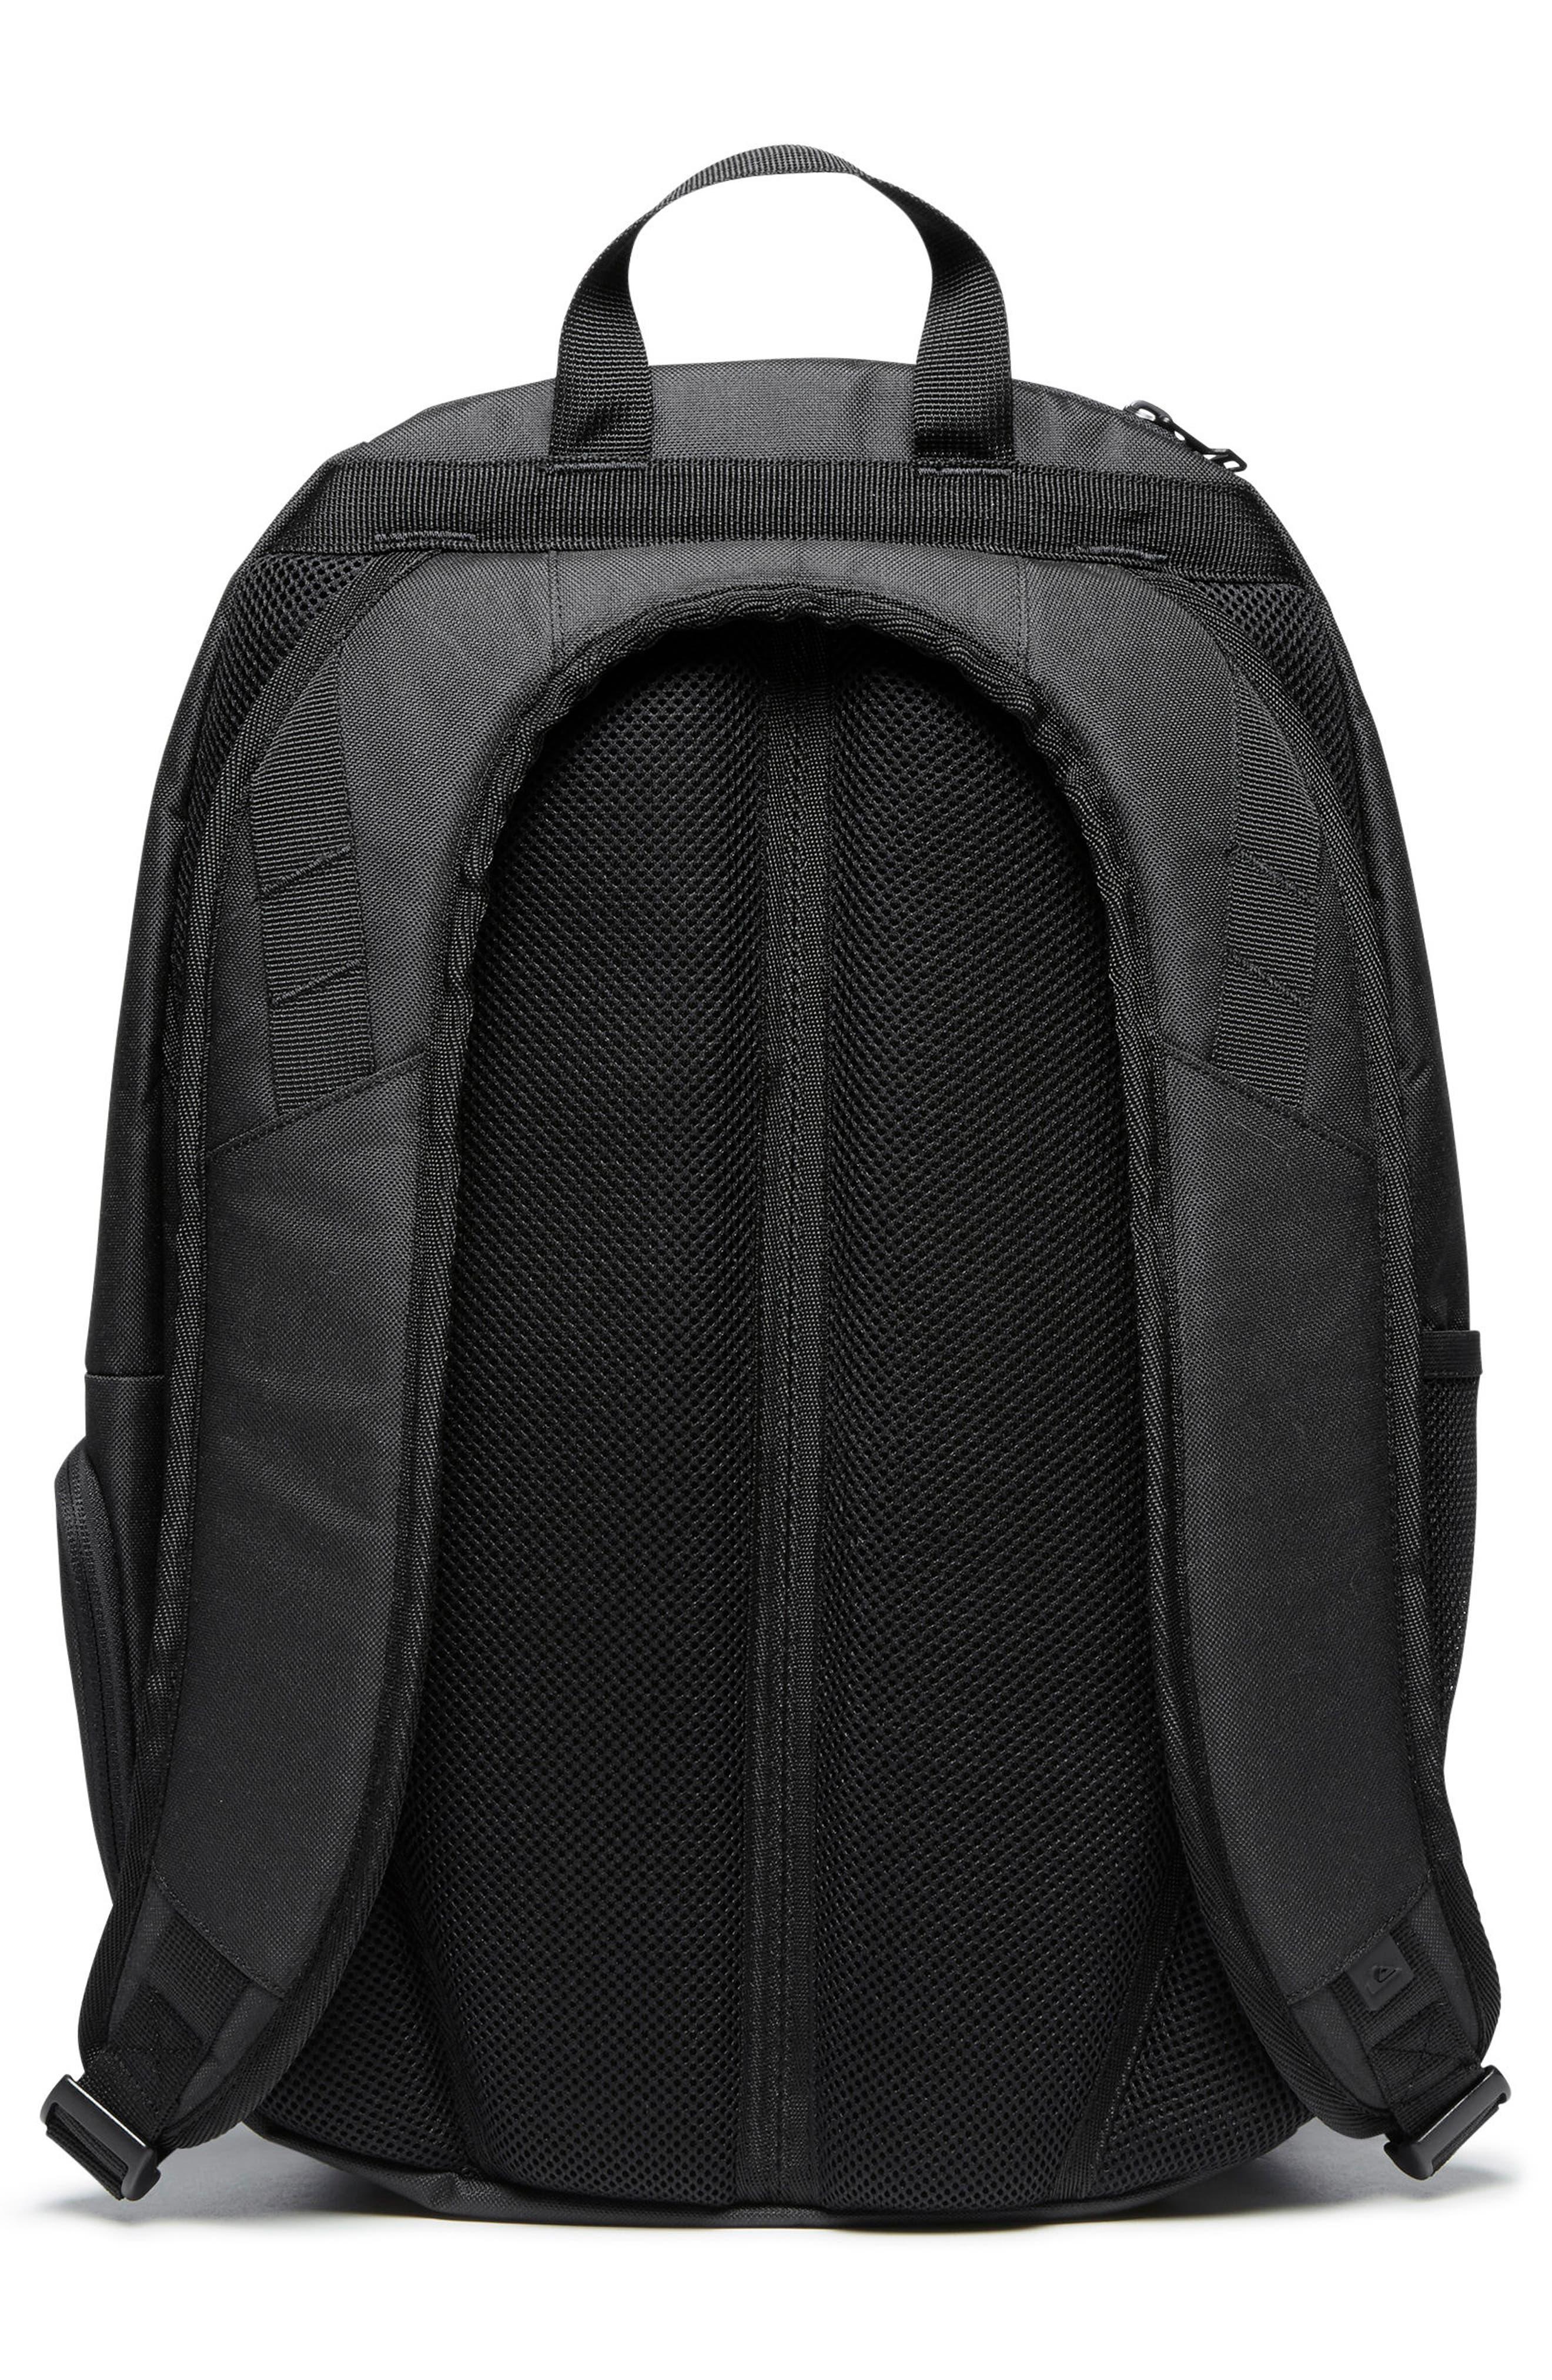 Diaper Backpack,                             Alternate thumbnail 3, color,                             BLACK